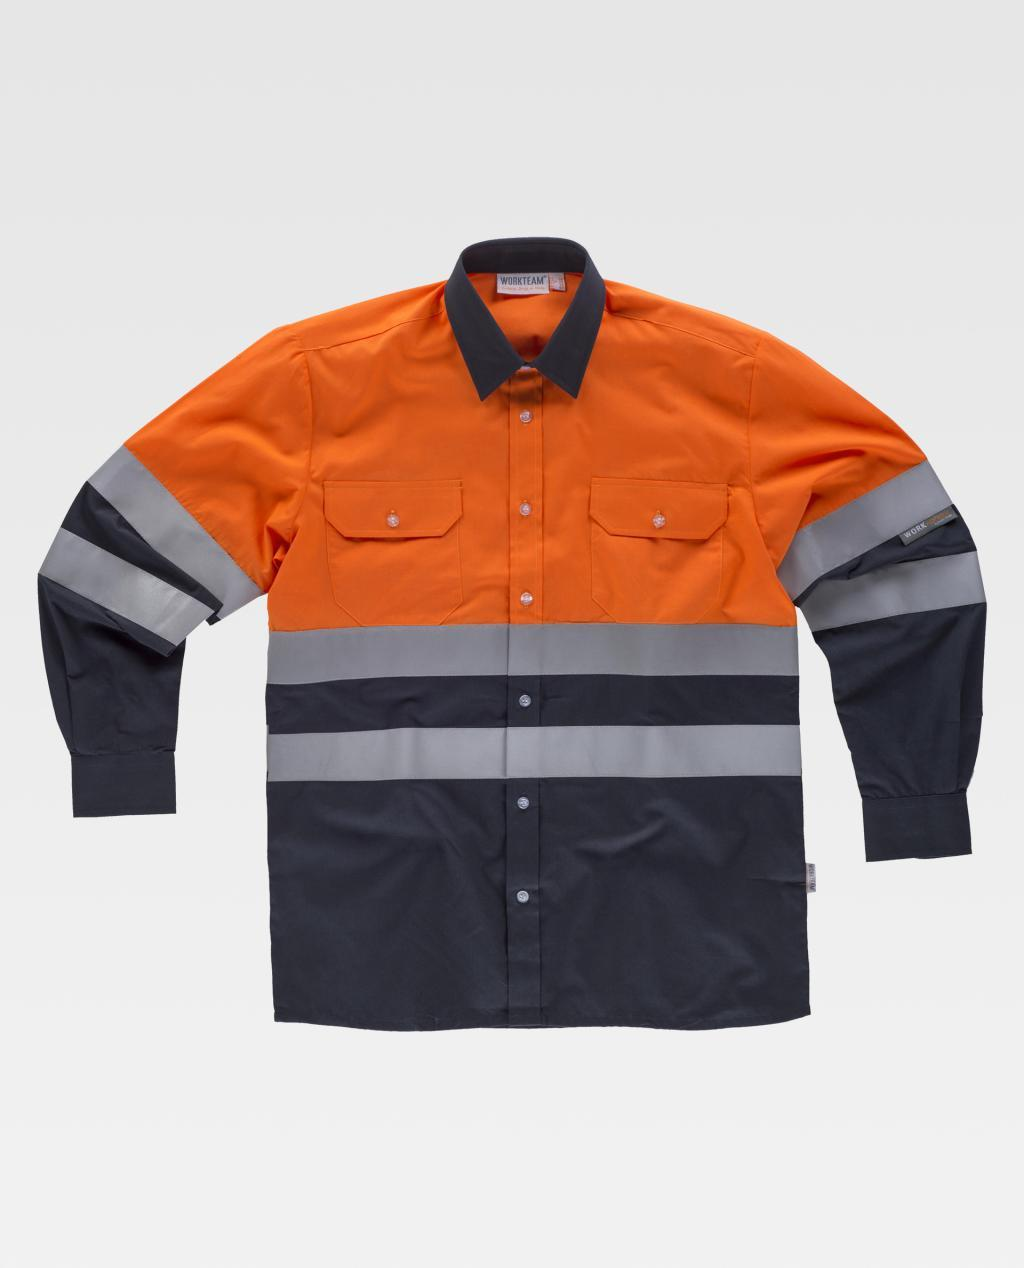 Camisa W/T Alta Visibilidade